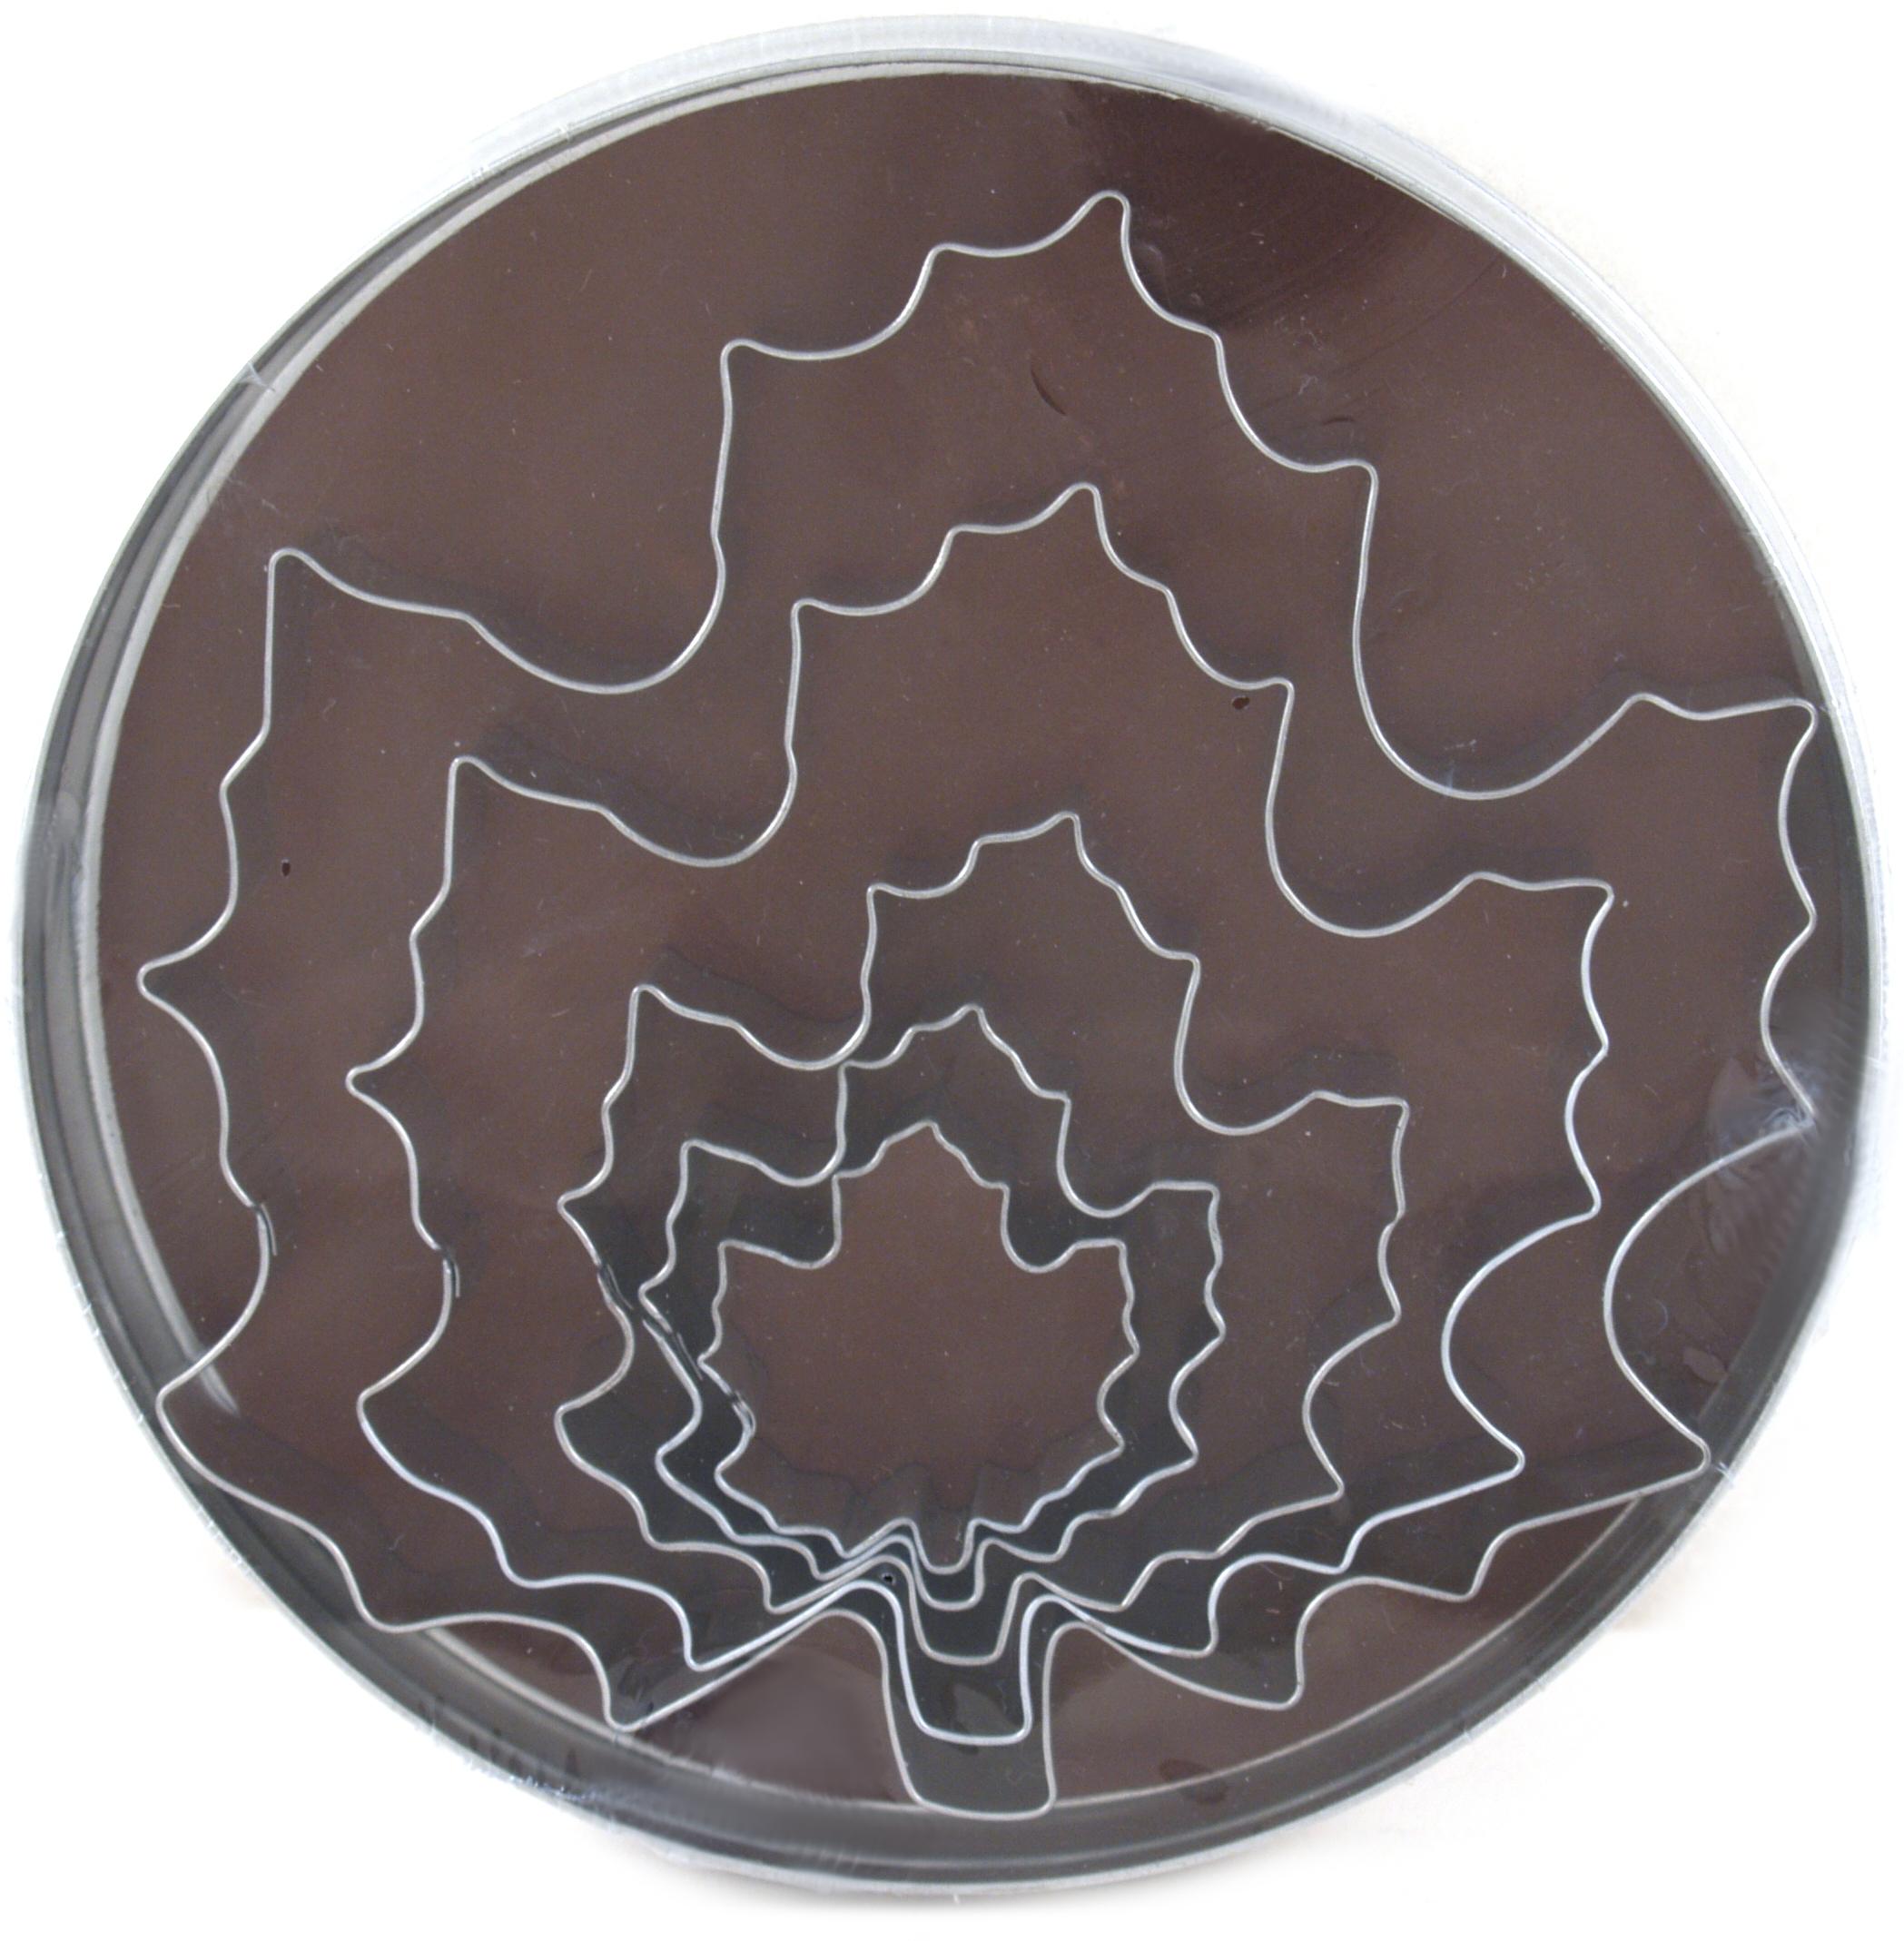 Foxrun 6092 maple leaf cc set